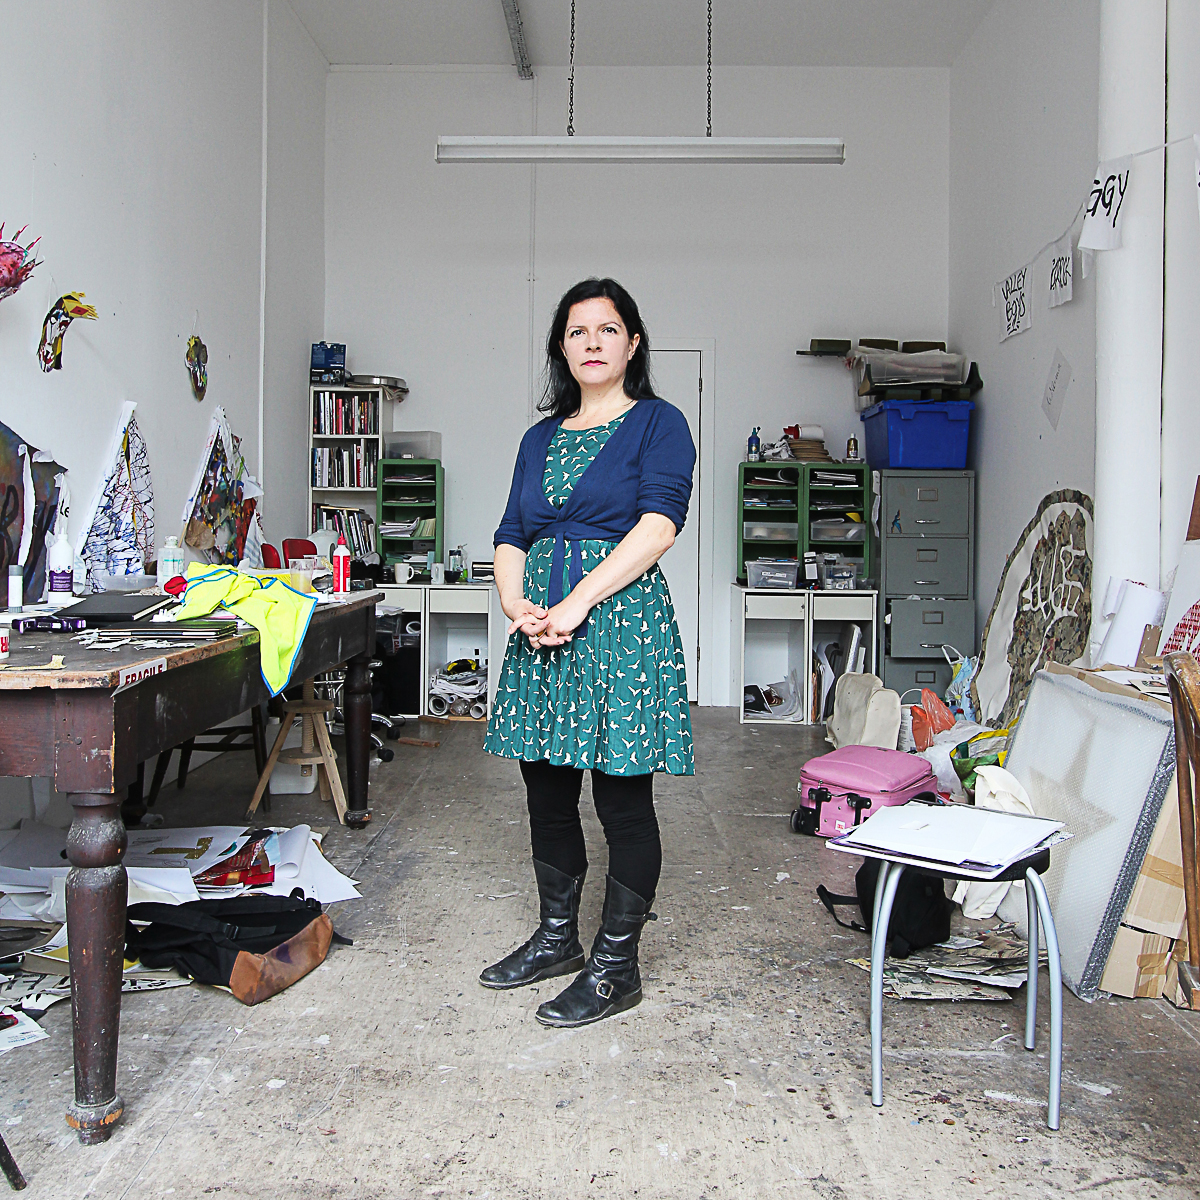 Janie Nicoll, visual artist